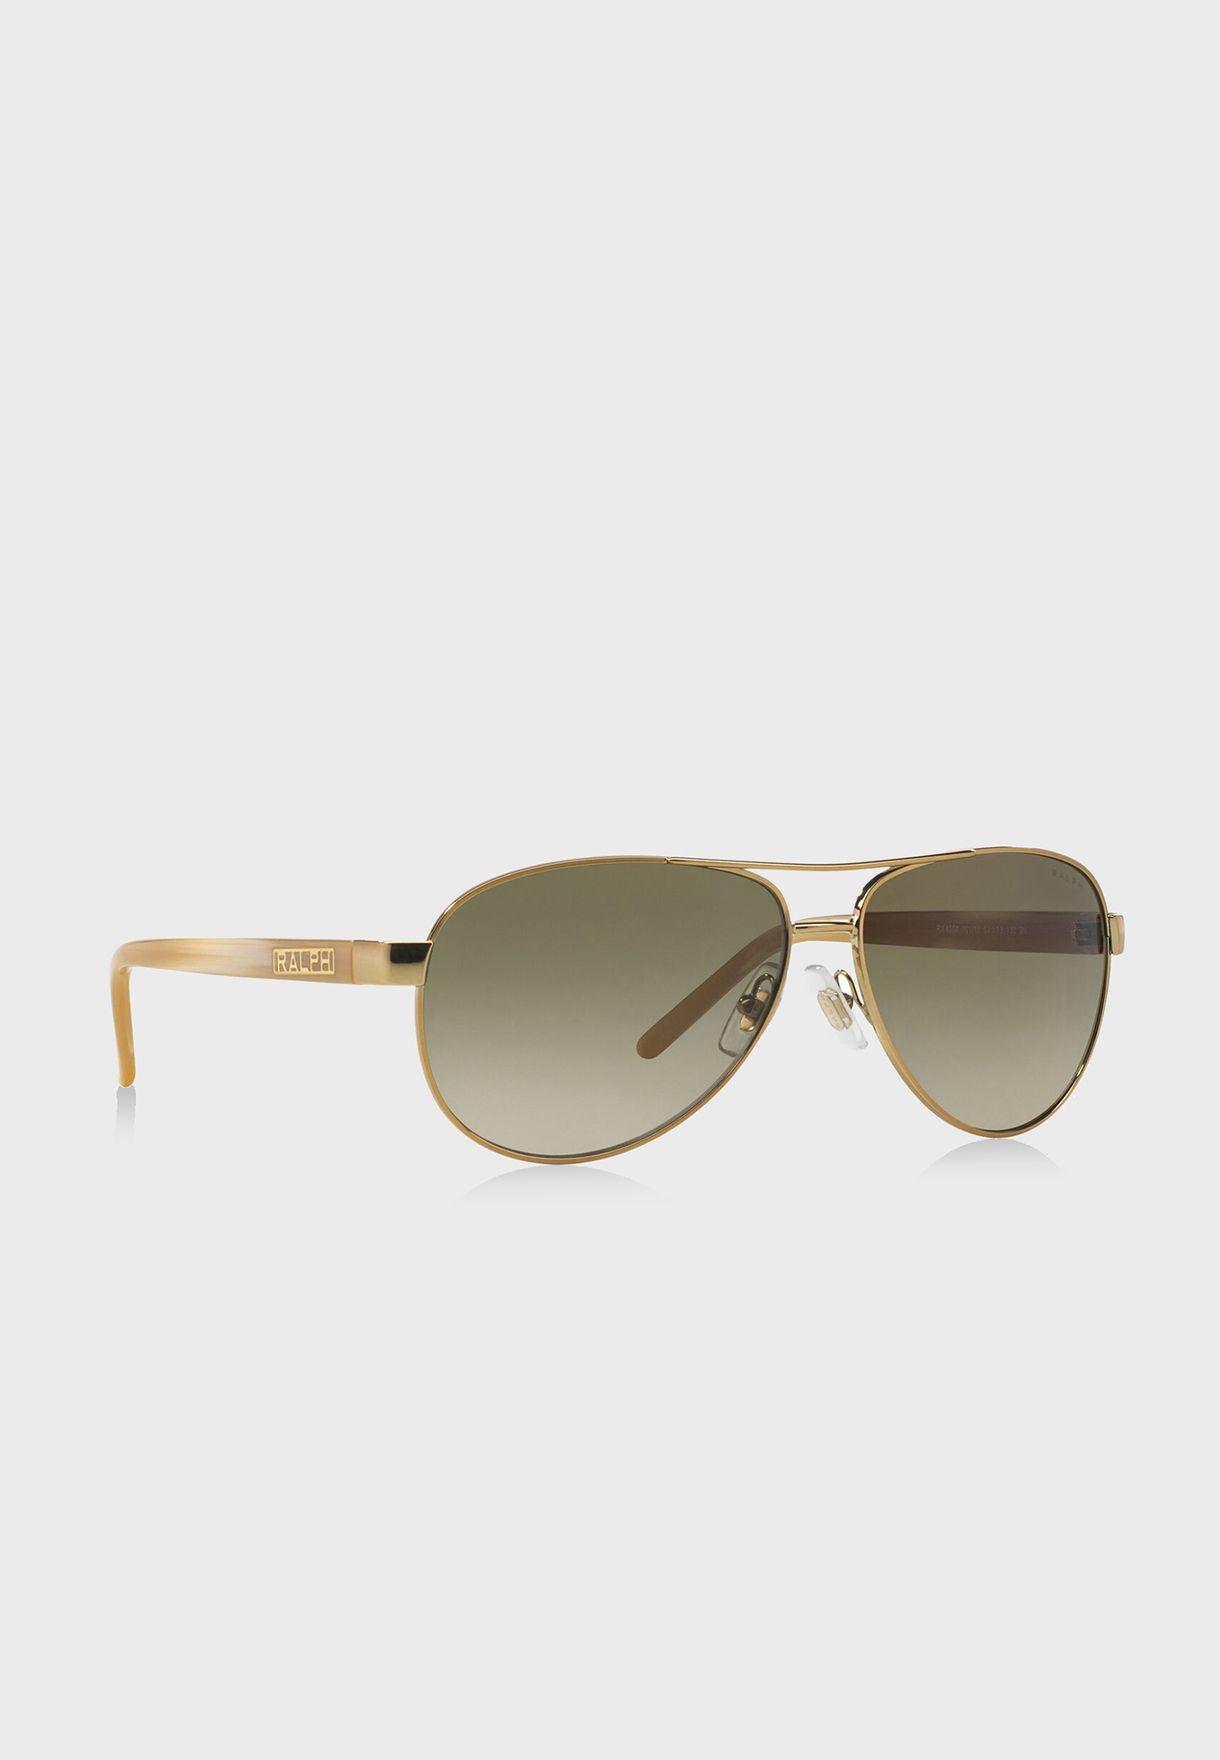 fdfaf21cfde Shop Polo Ralph Lauren gold Aviator Sunglasses 8.05E+11 for ...